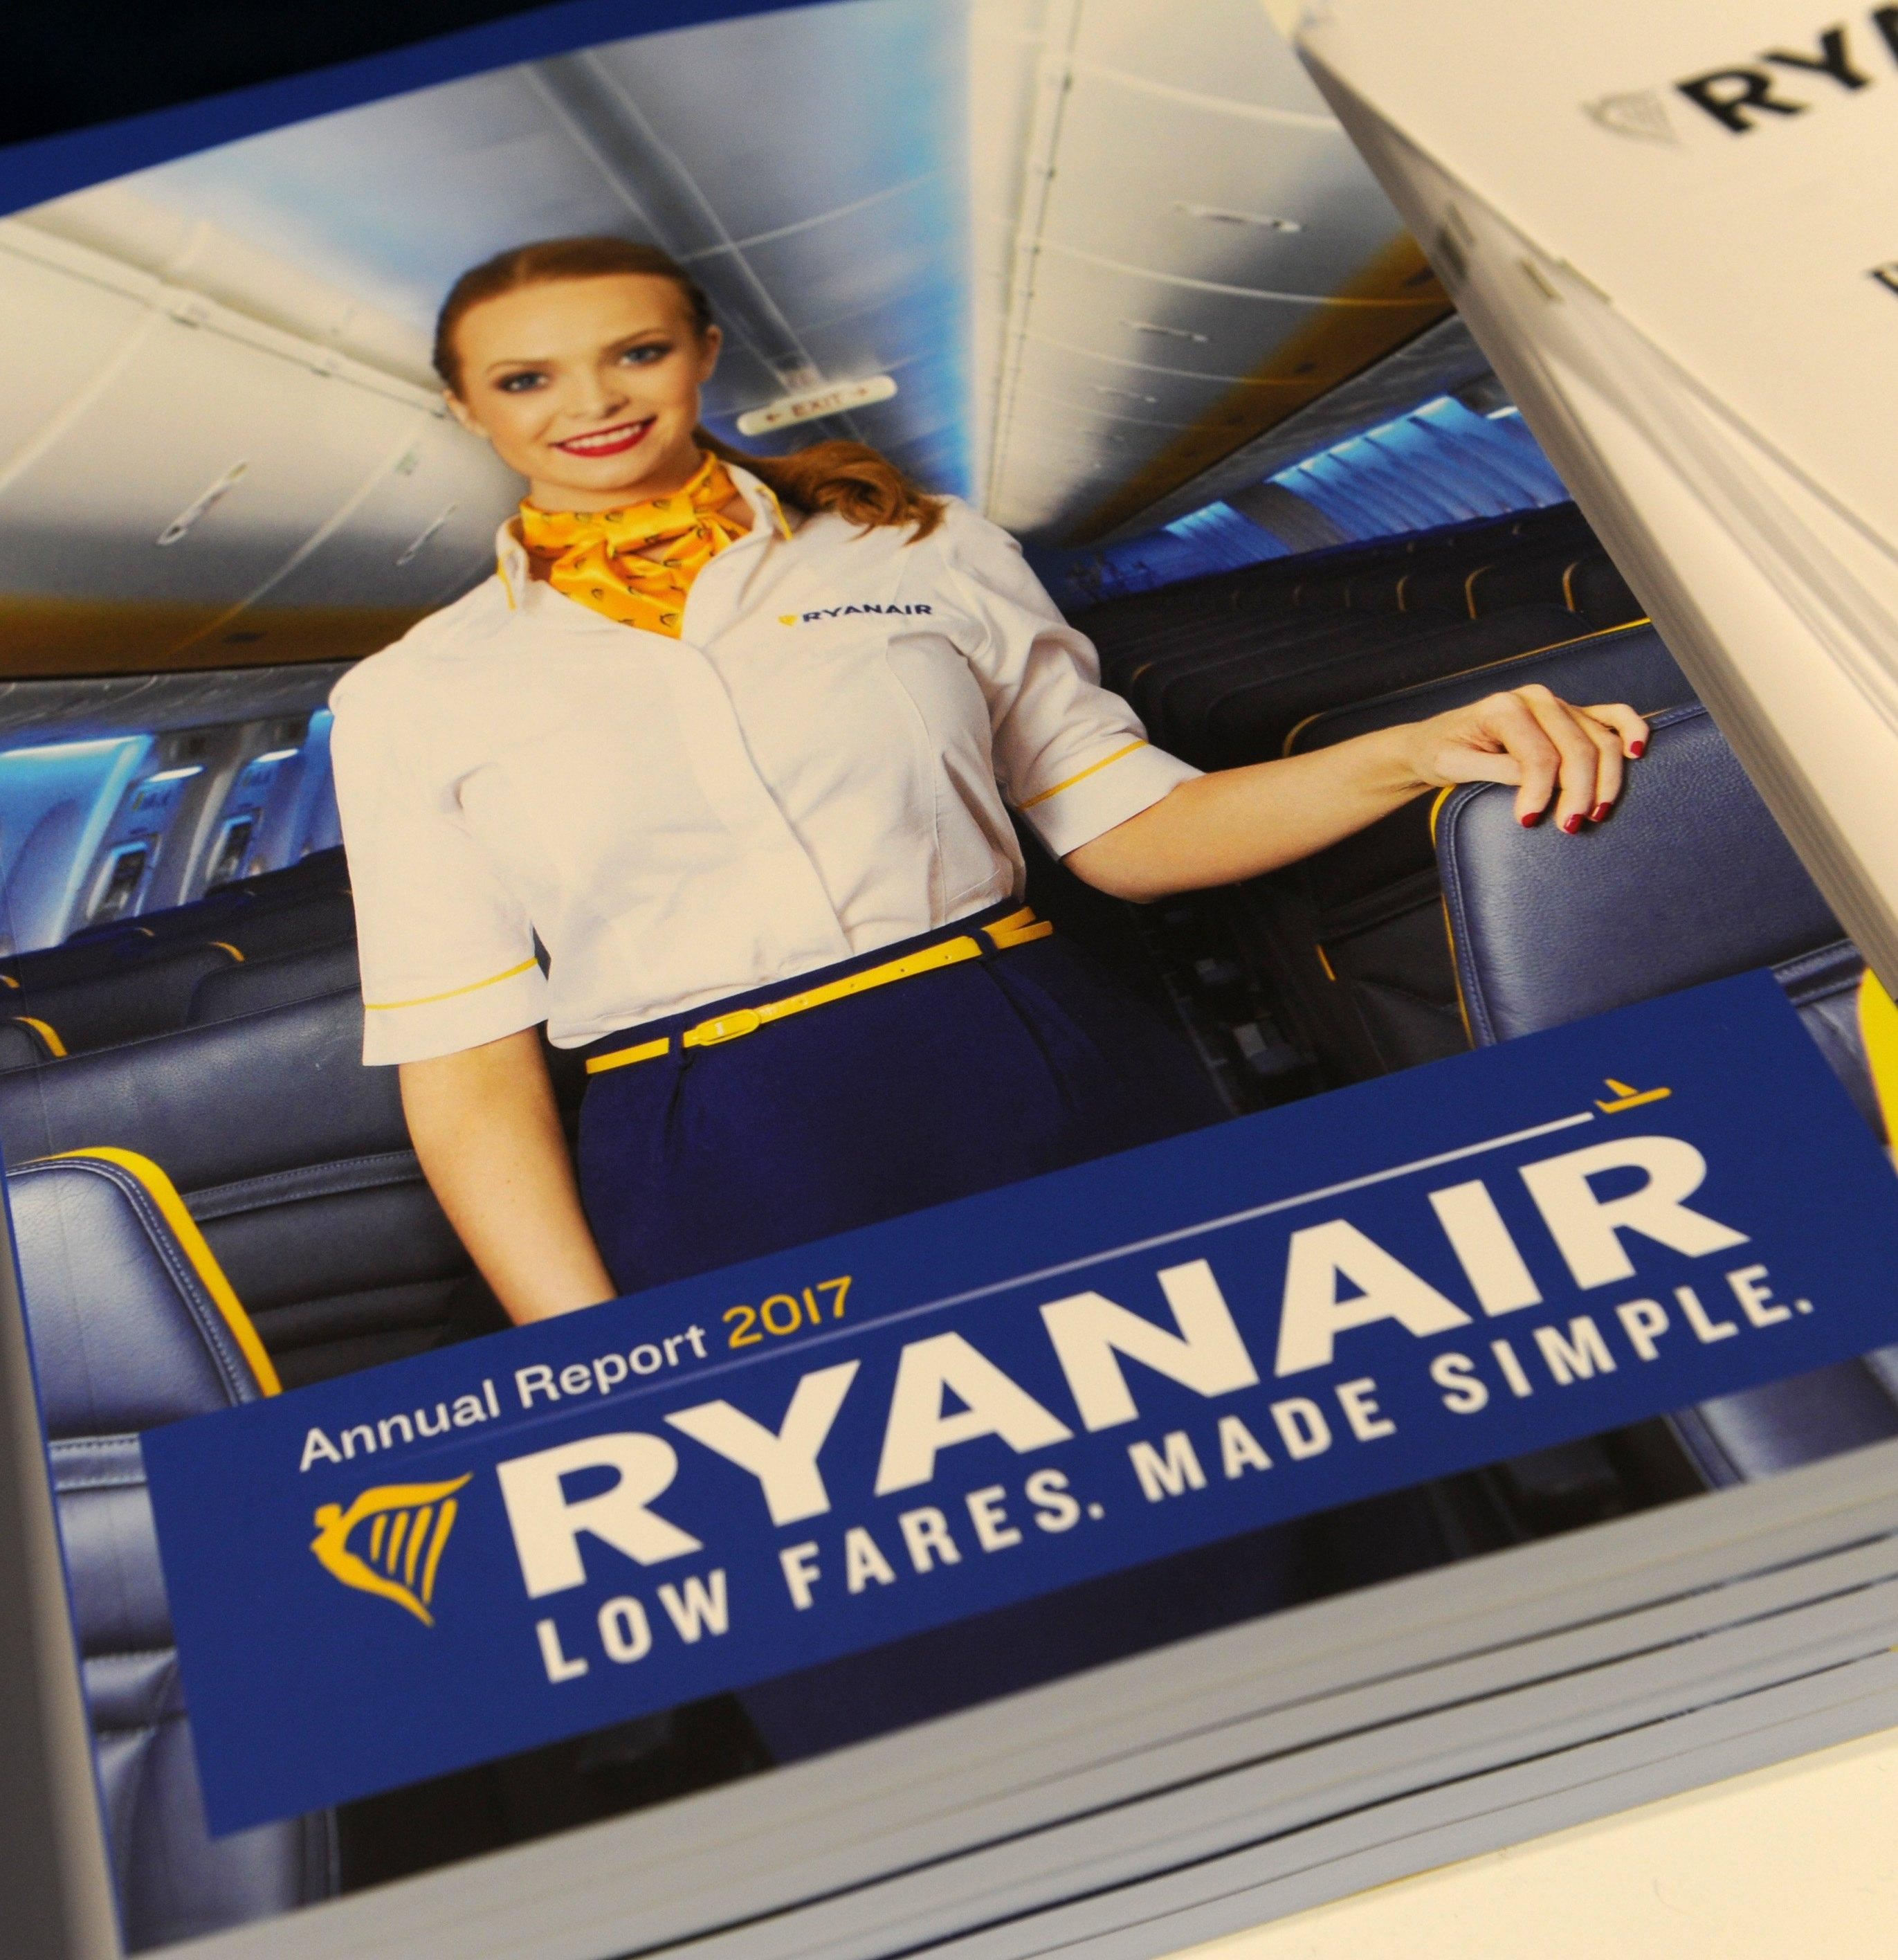 Antitrust: procedimento contro Ryanair